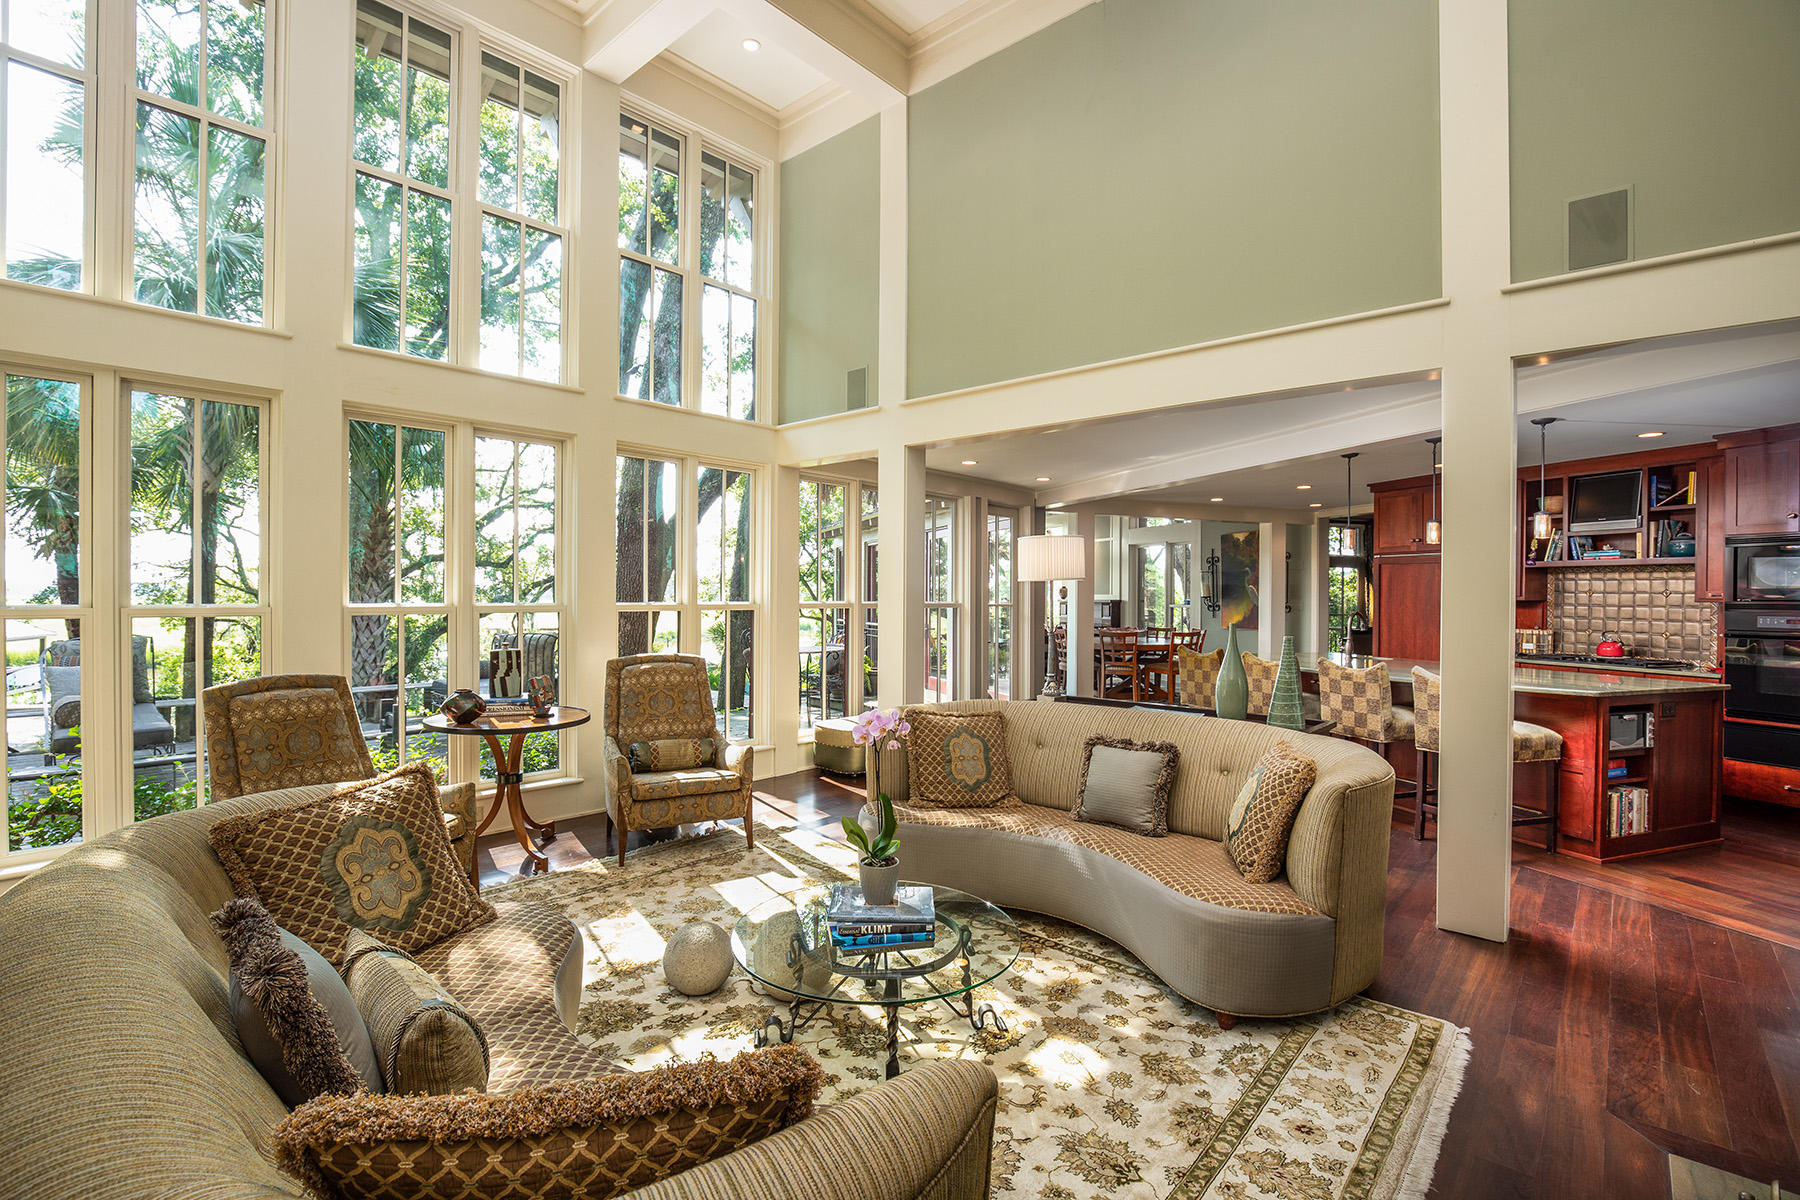 Ellis Oaks Homes For Sale - 672 Ellis Oak, Charleston, SC - 1